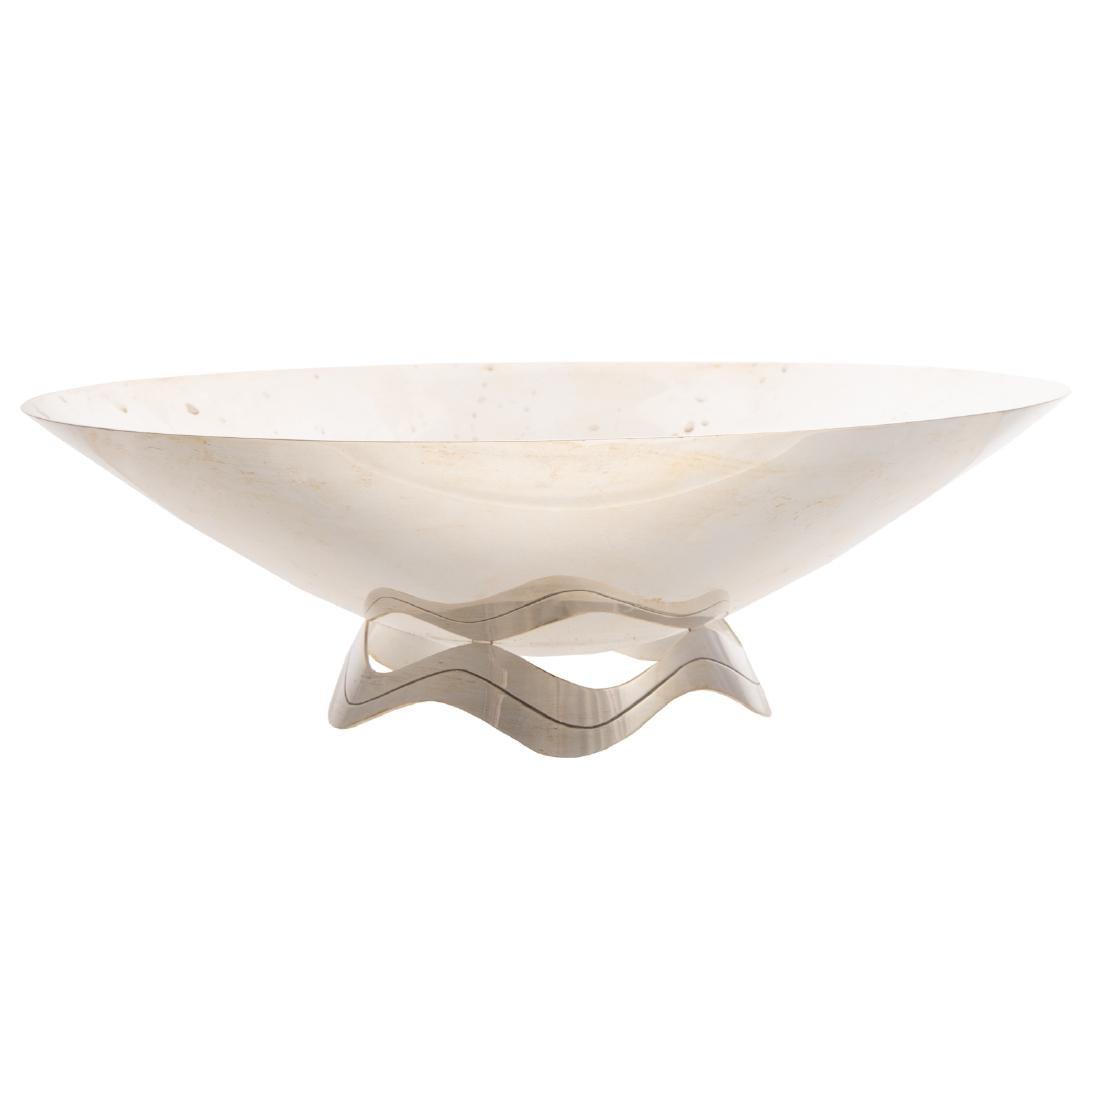 Tiffany mid-century modern sterling center bowl